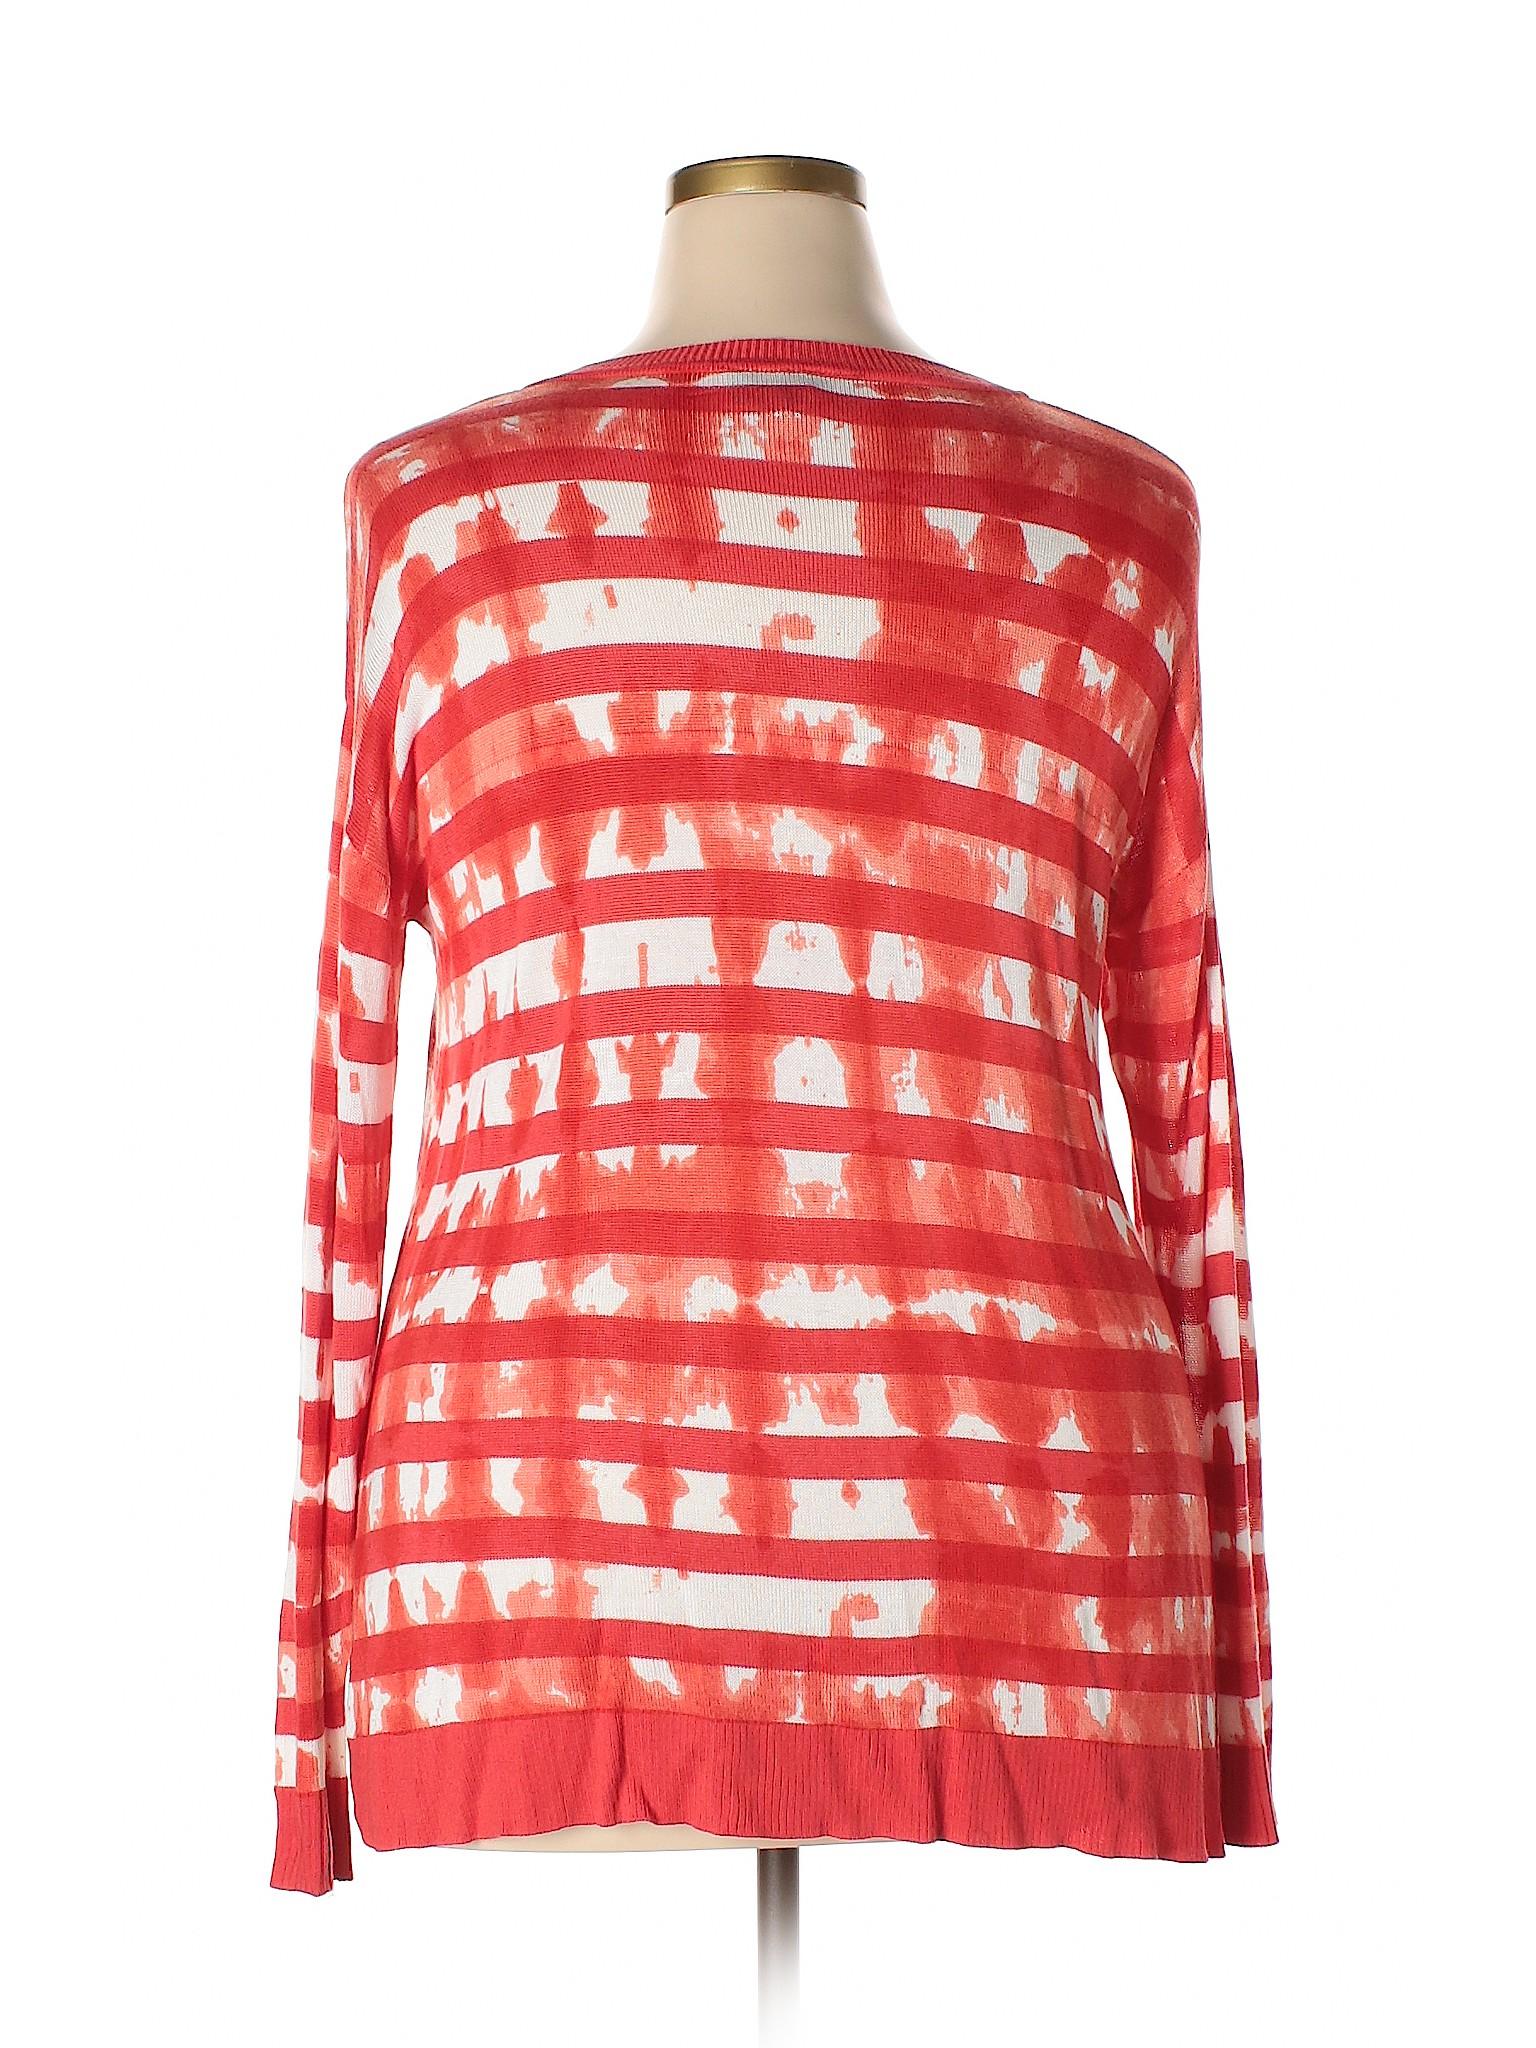 Boutique Lane Bryant Lane Sweater Bryant Pullover Pullover Sweater Boutique z4zFwrq